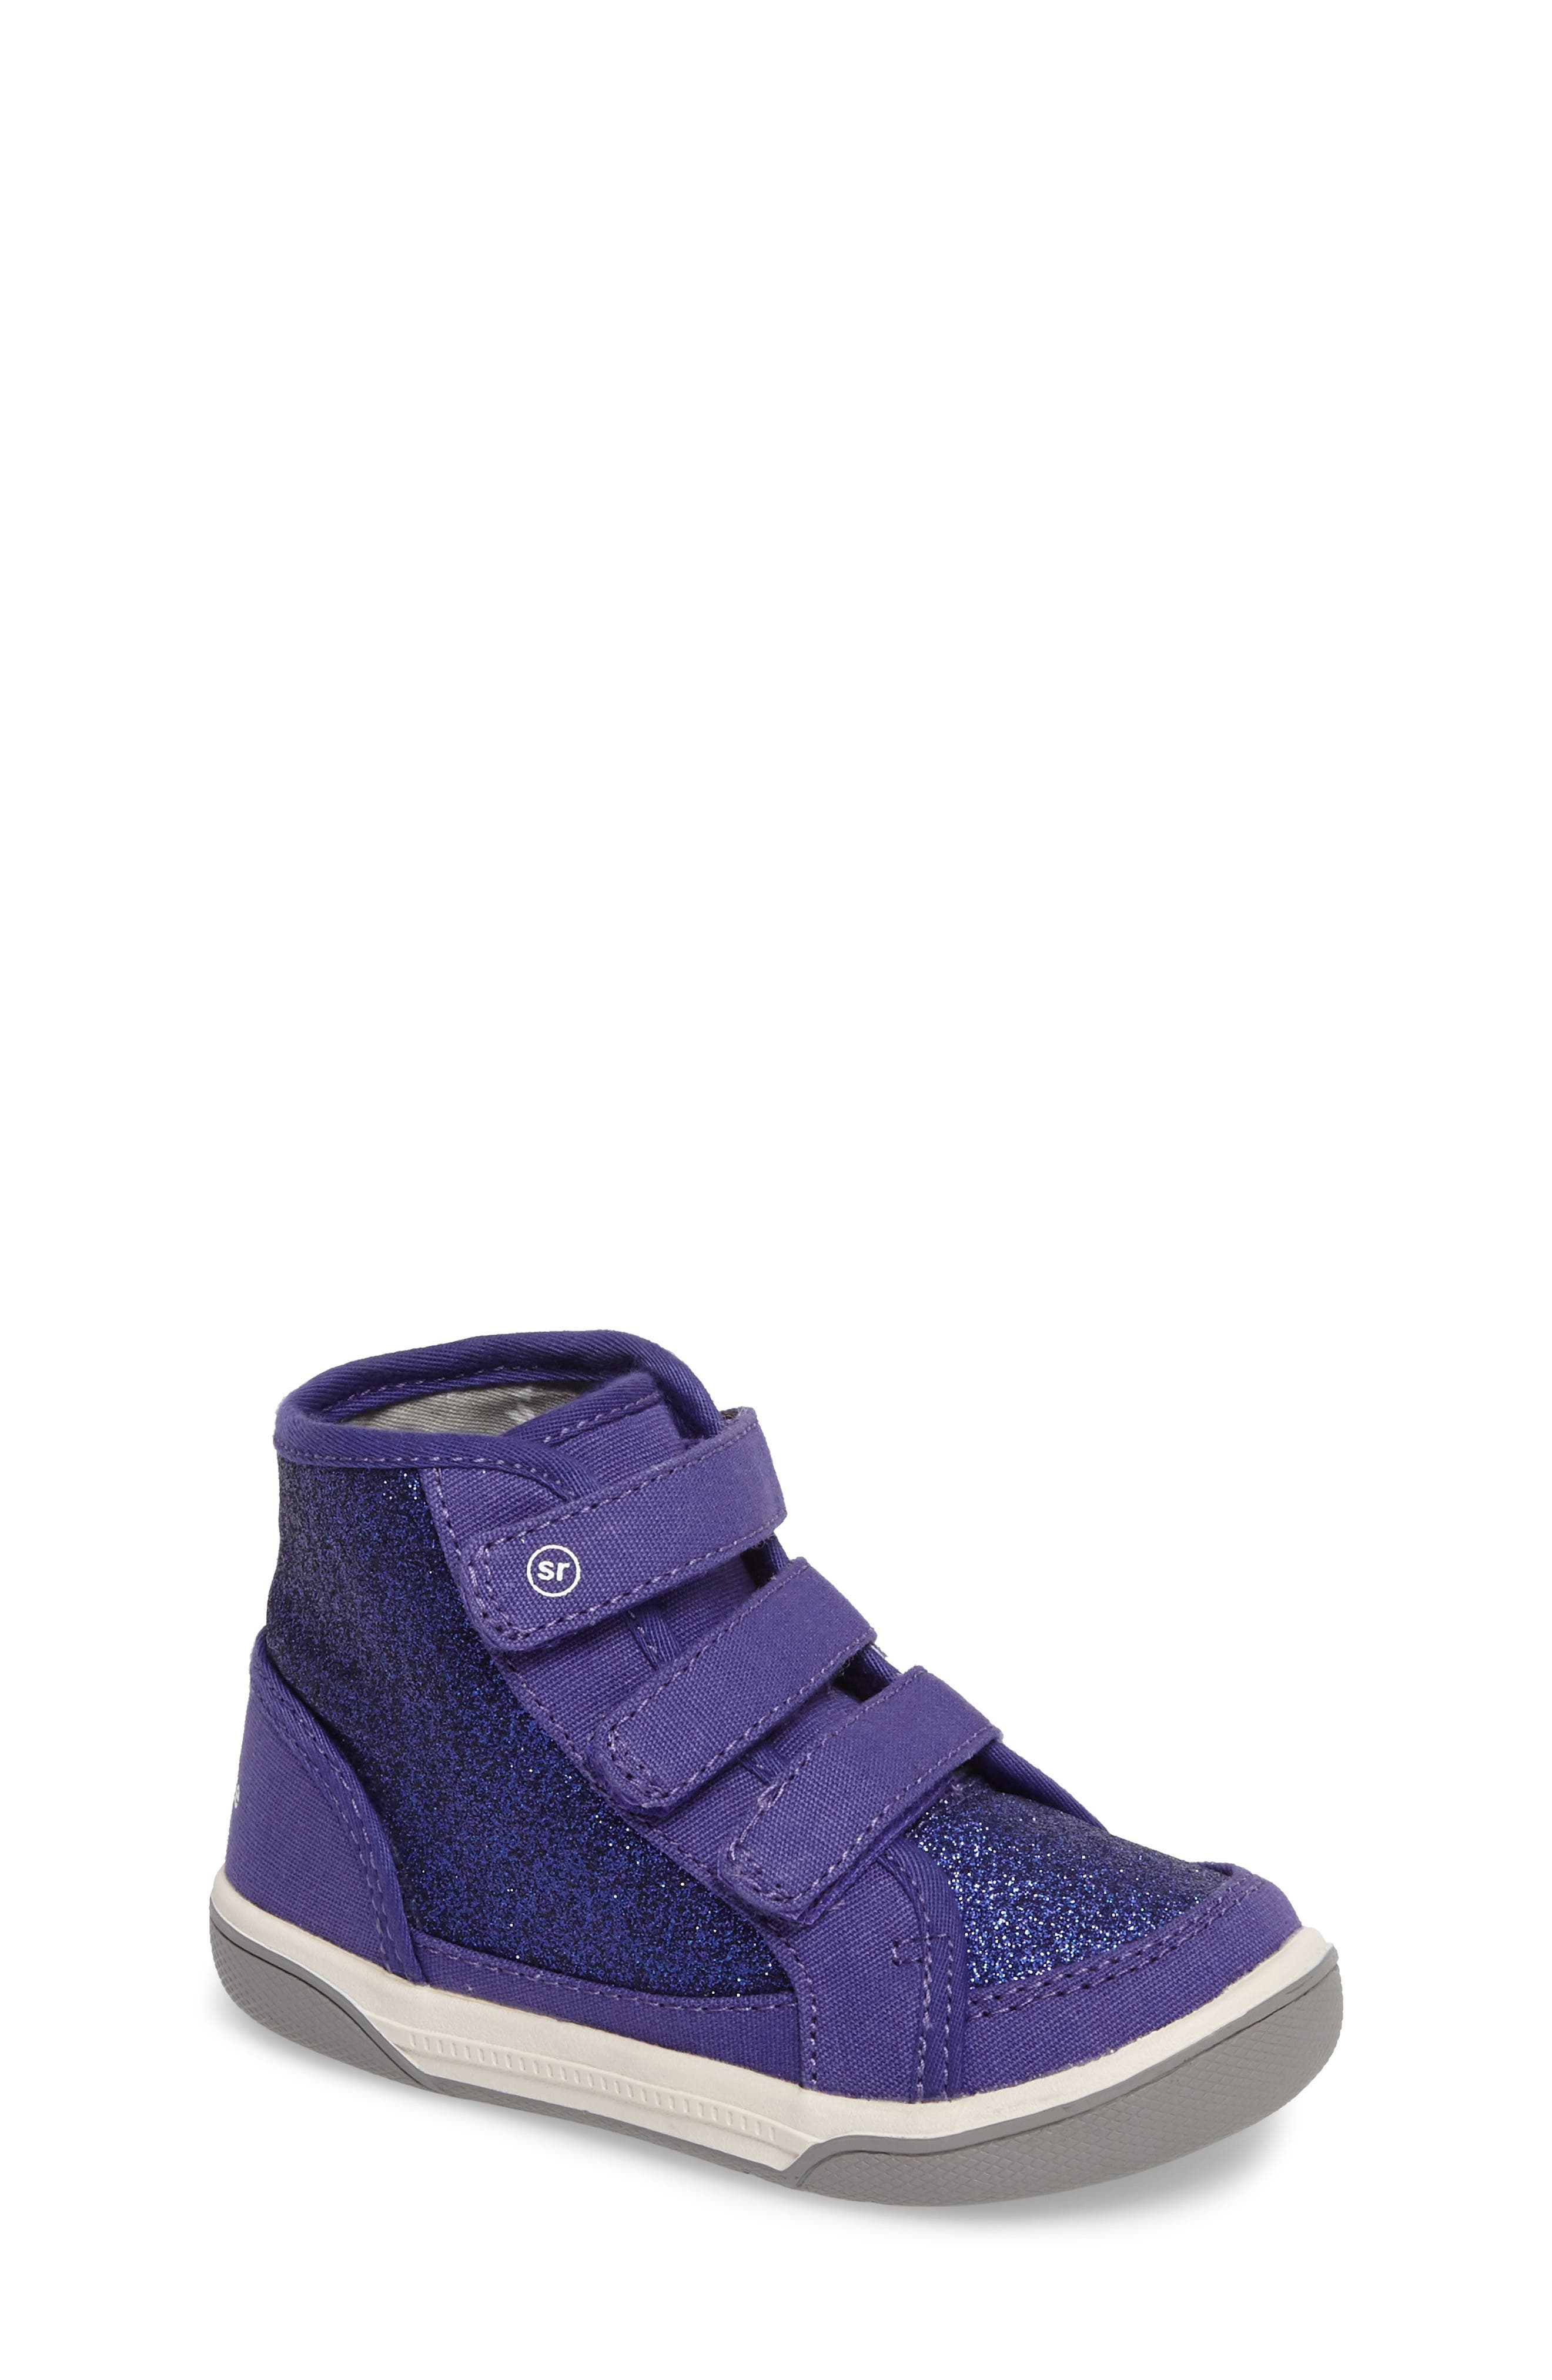 Main Image - Stride Rite Ellis Glitter High Top Sneaker (Baby, Walker & Toddler)